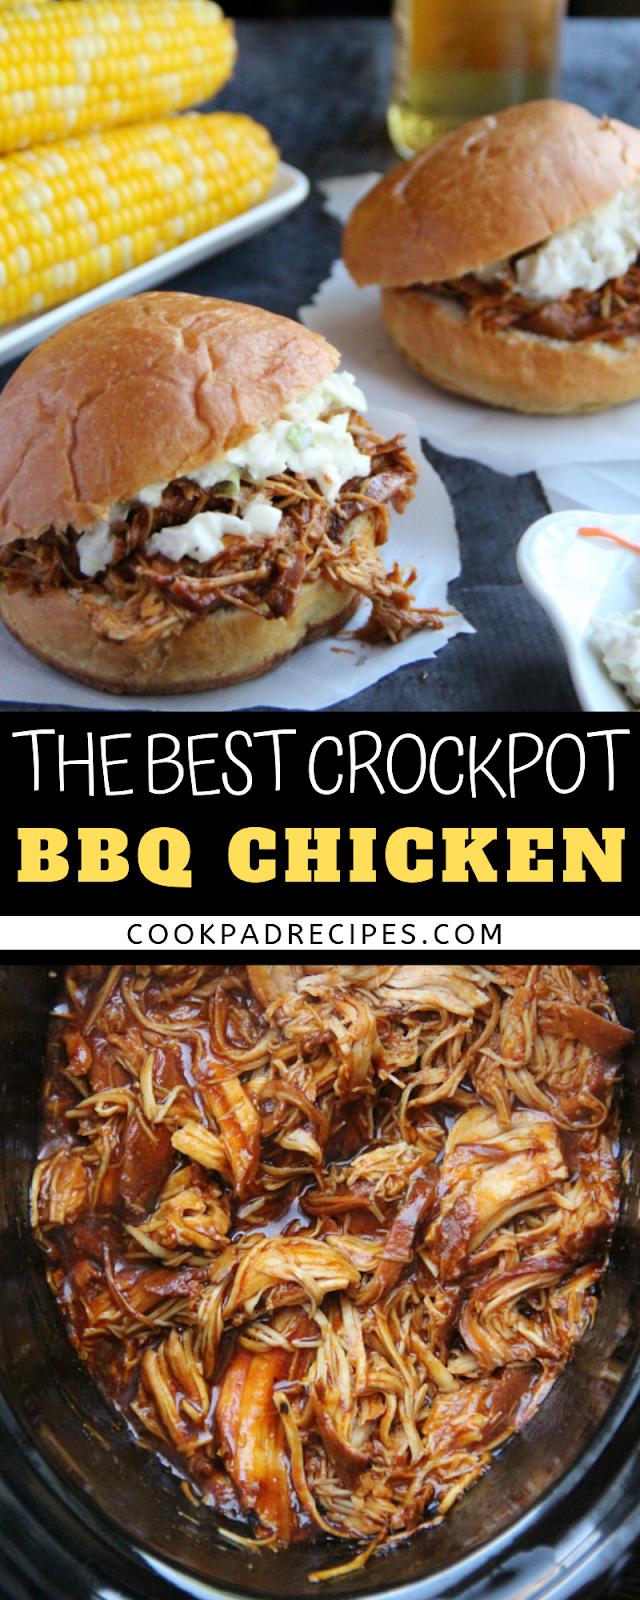 The Bеѕt Crockpot BBQ Chicken